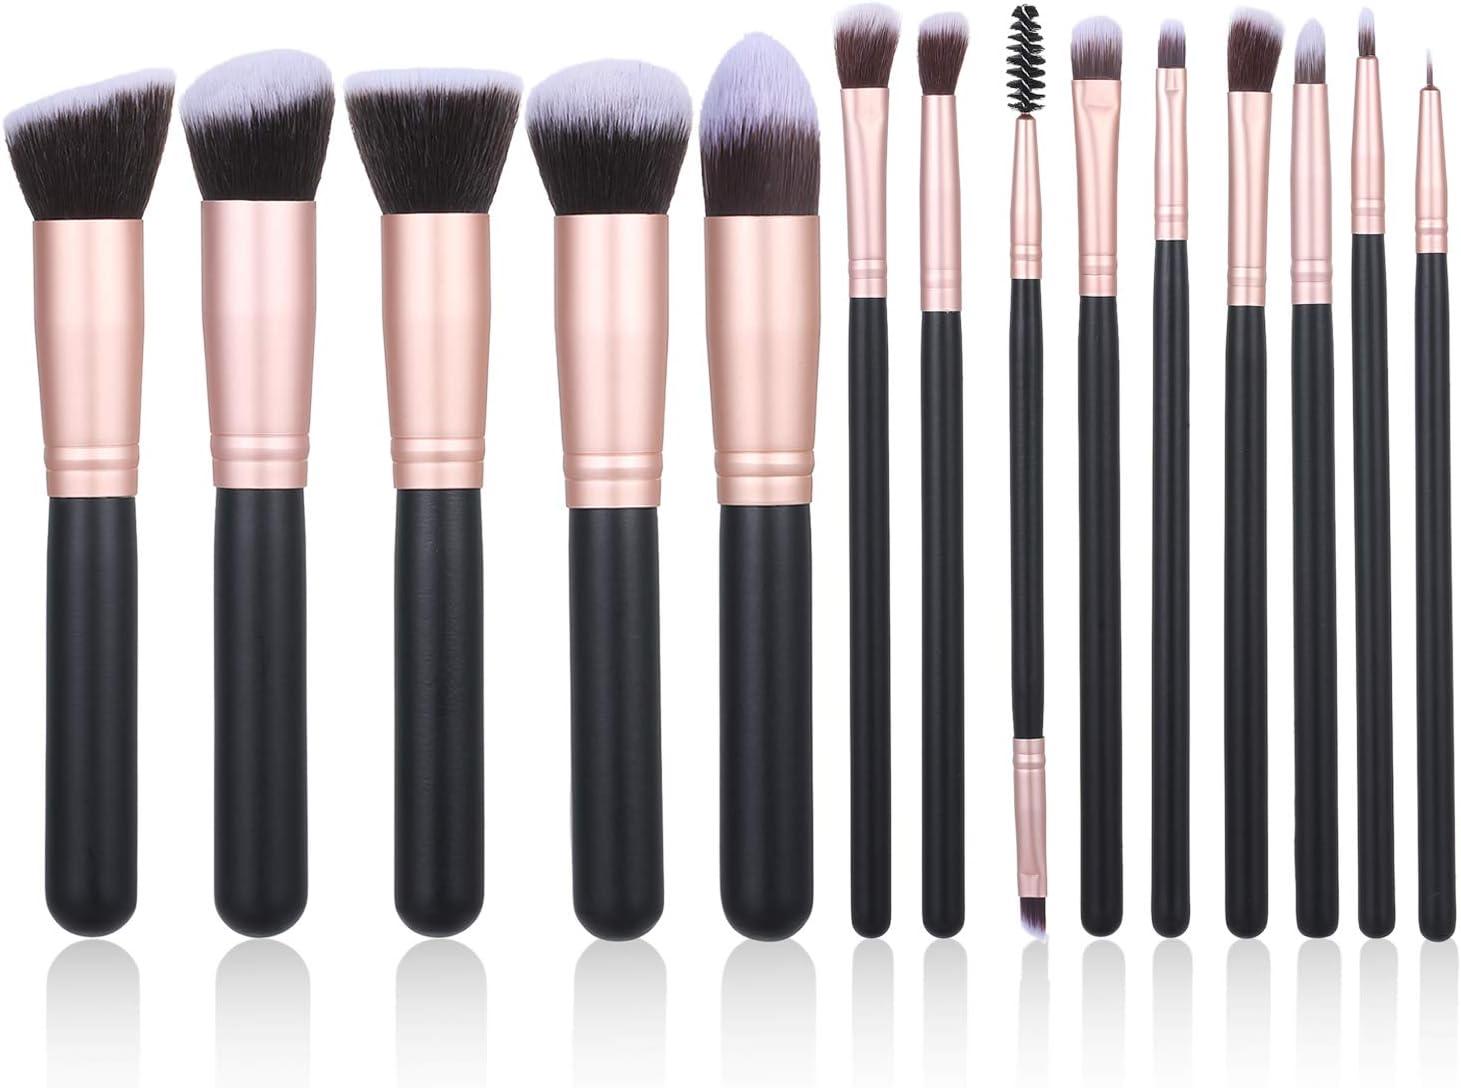 Kit de 14 brochas de maquillake Decdeal por sólo 7,99€ con el #código: 5SD6YHNM